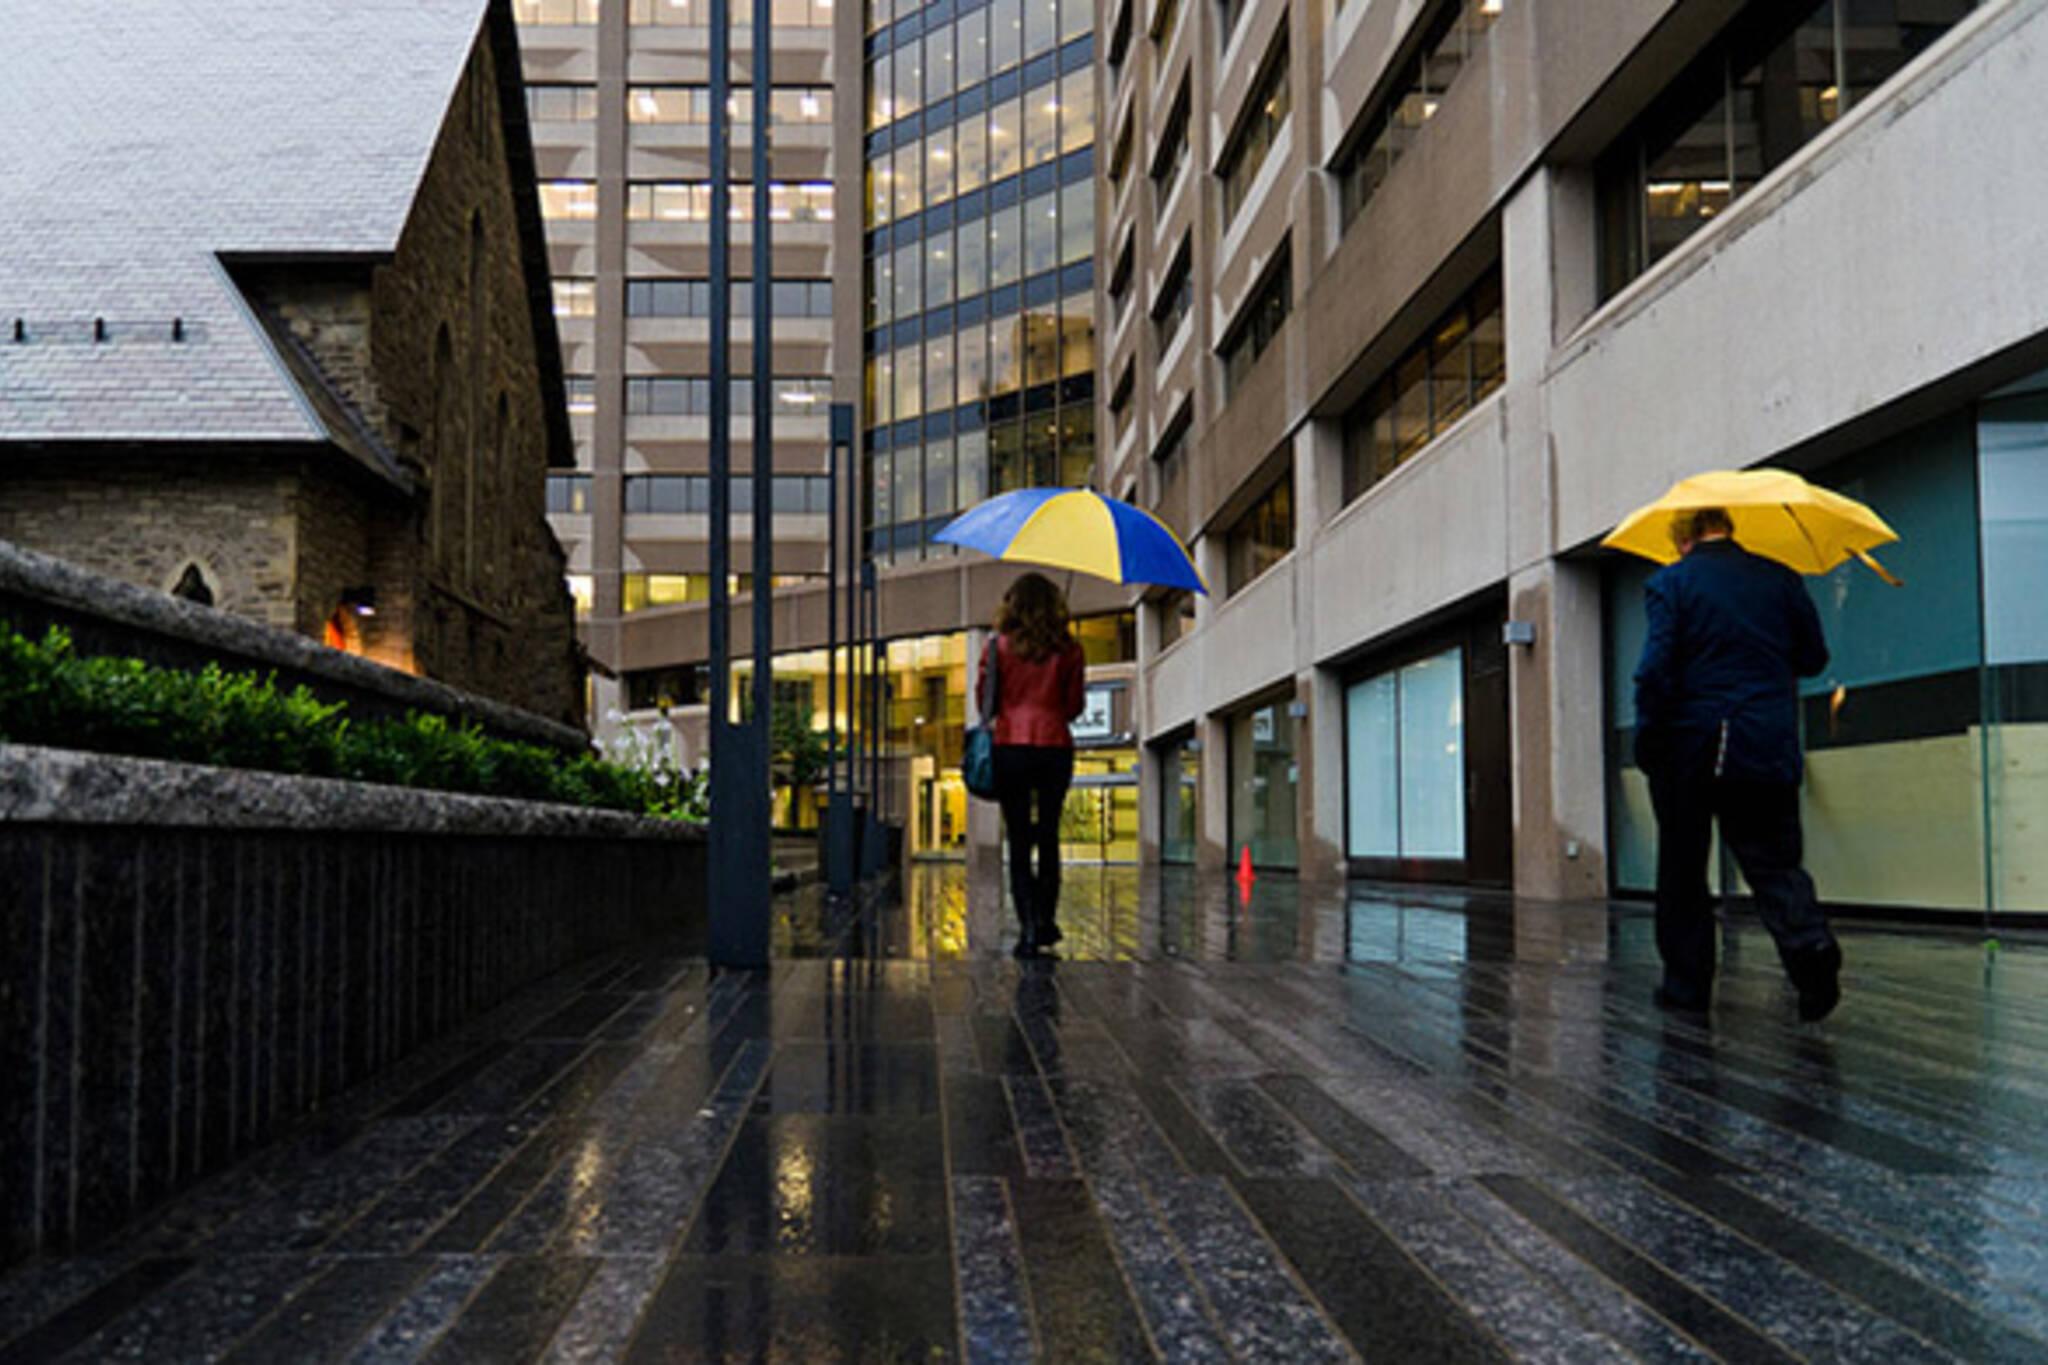 toronto, rain, umbrella